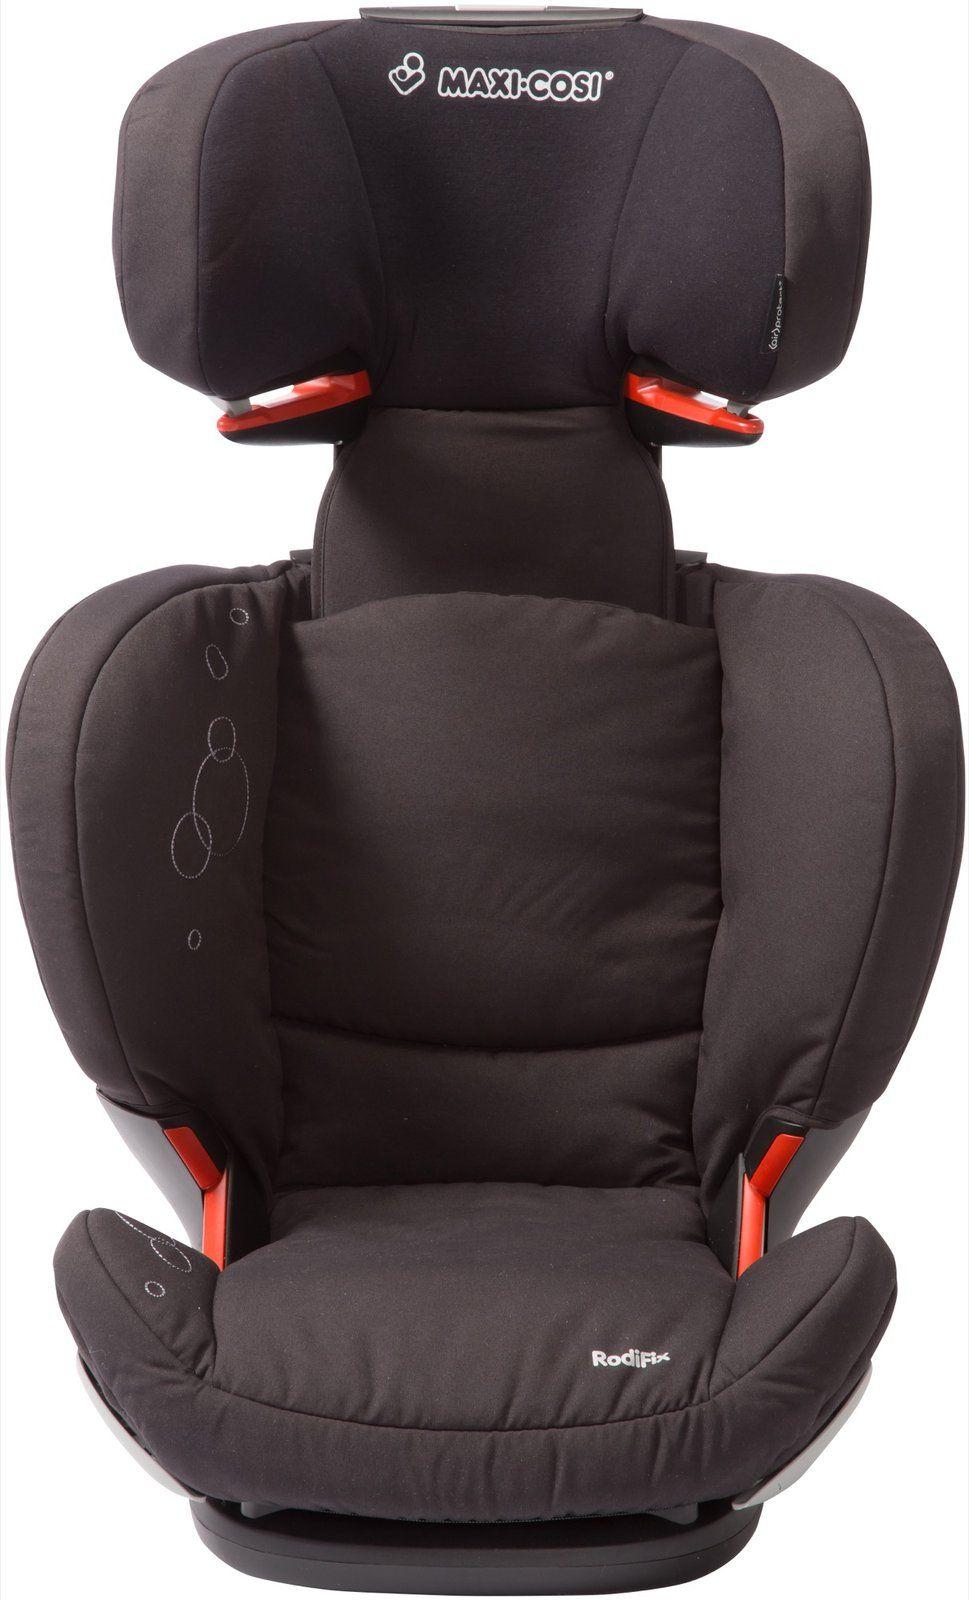 Maxi Cosi Rodifix Booster Car Seat Total Black Free